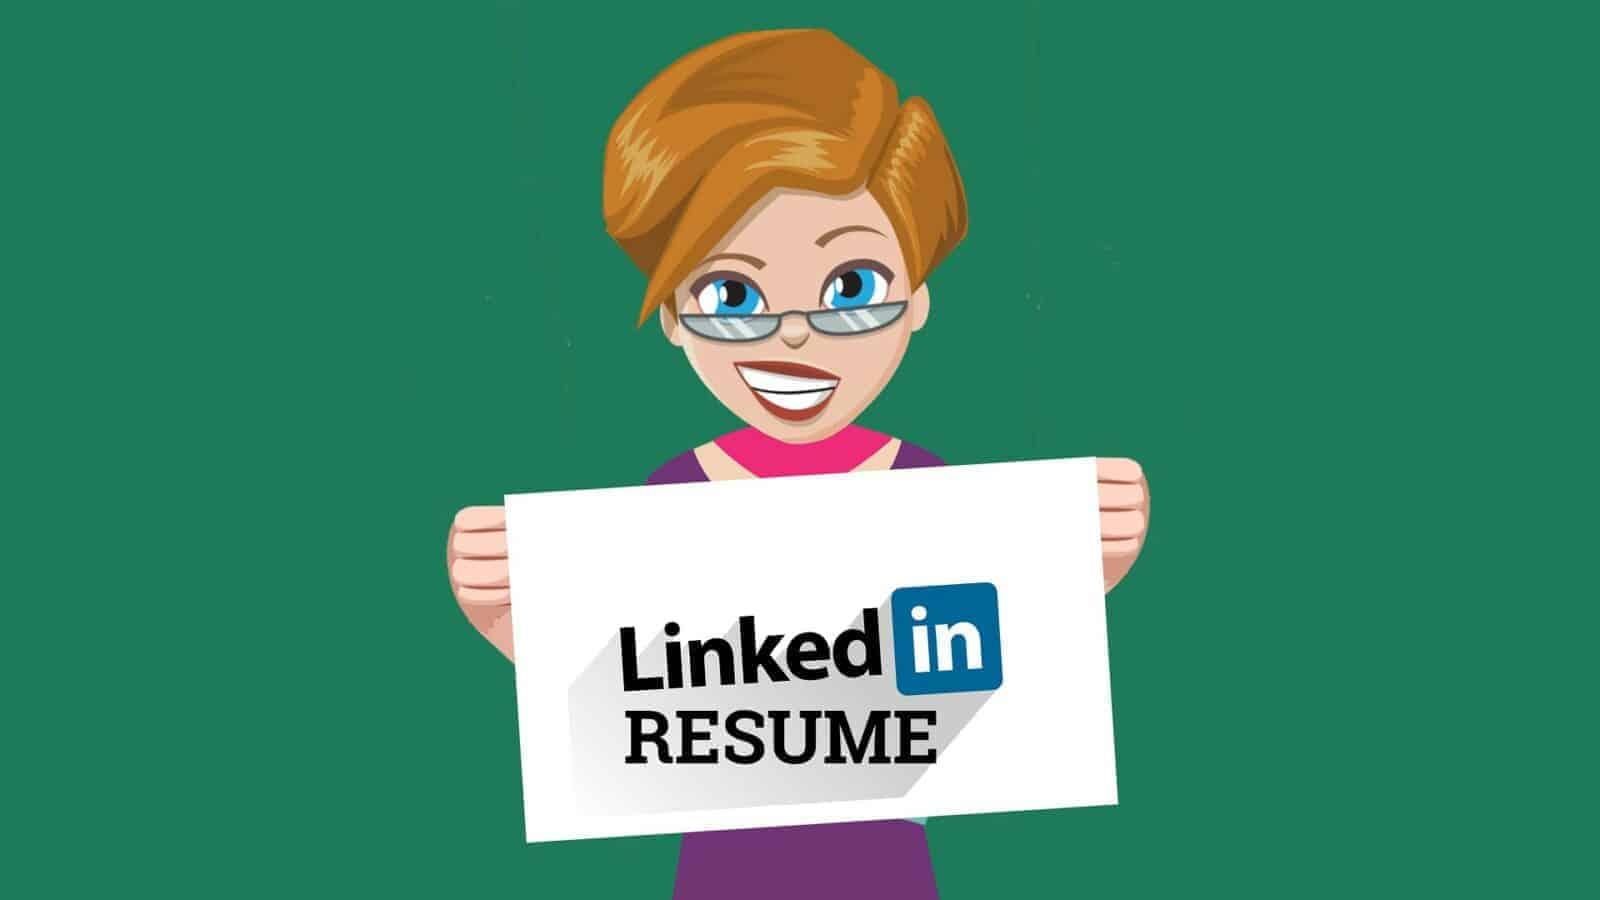 how to put linkedin on resume